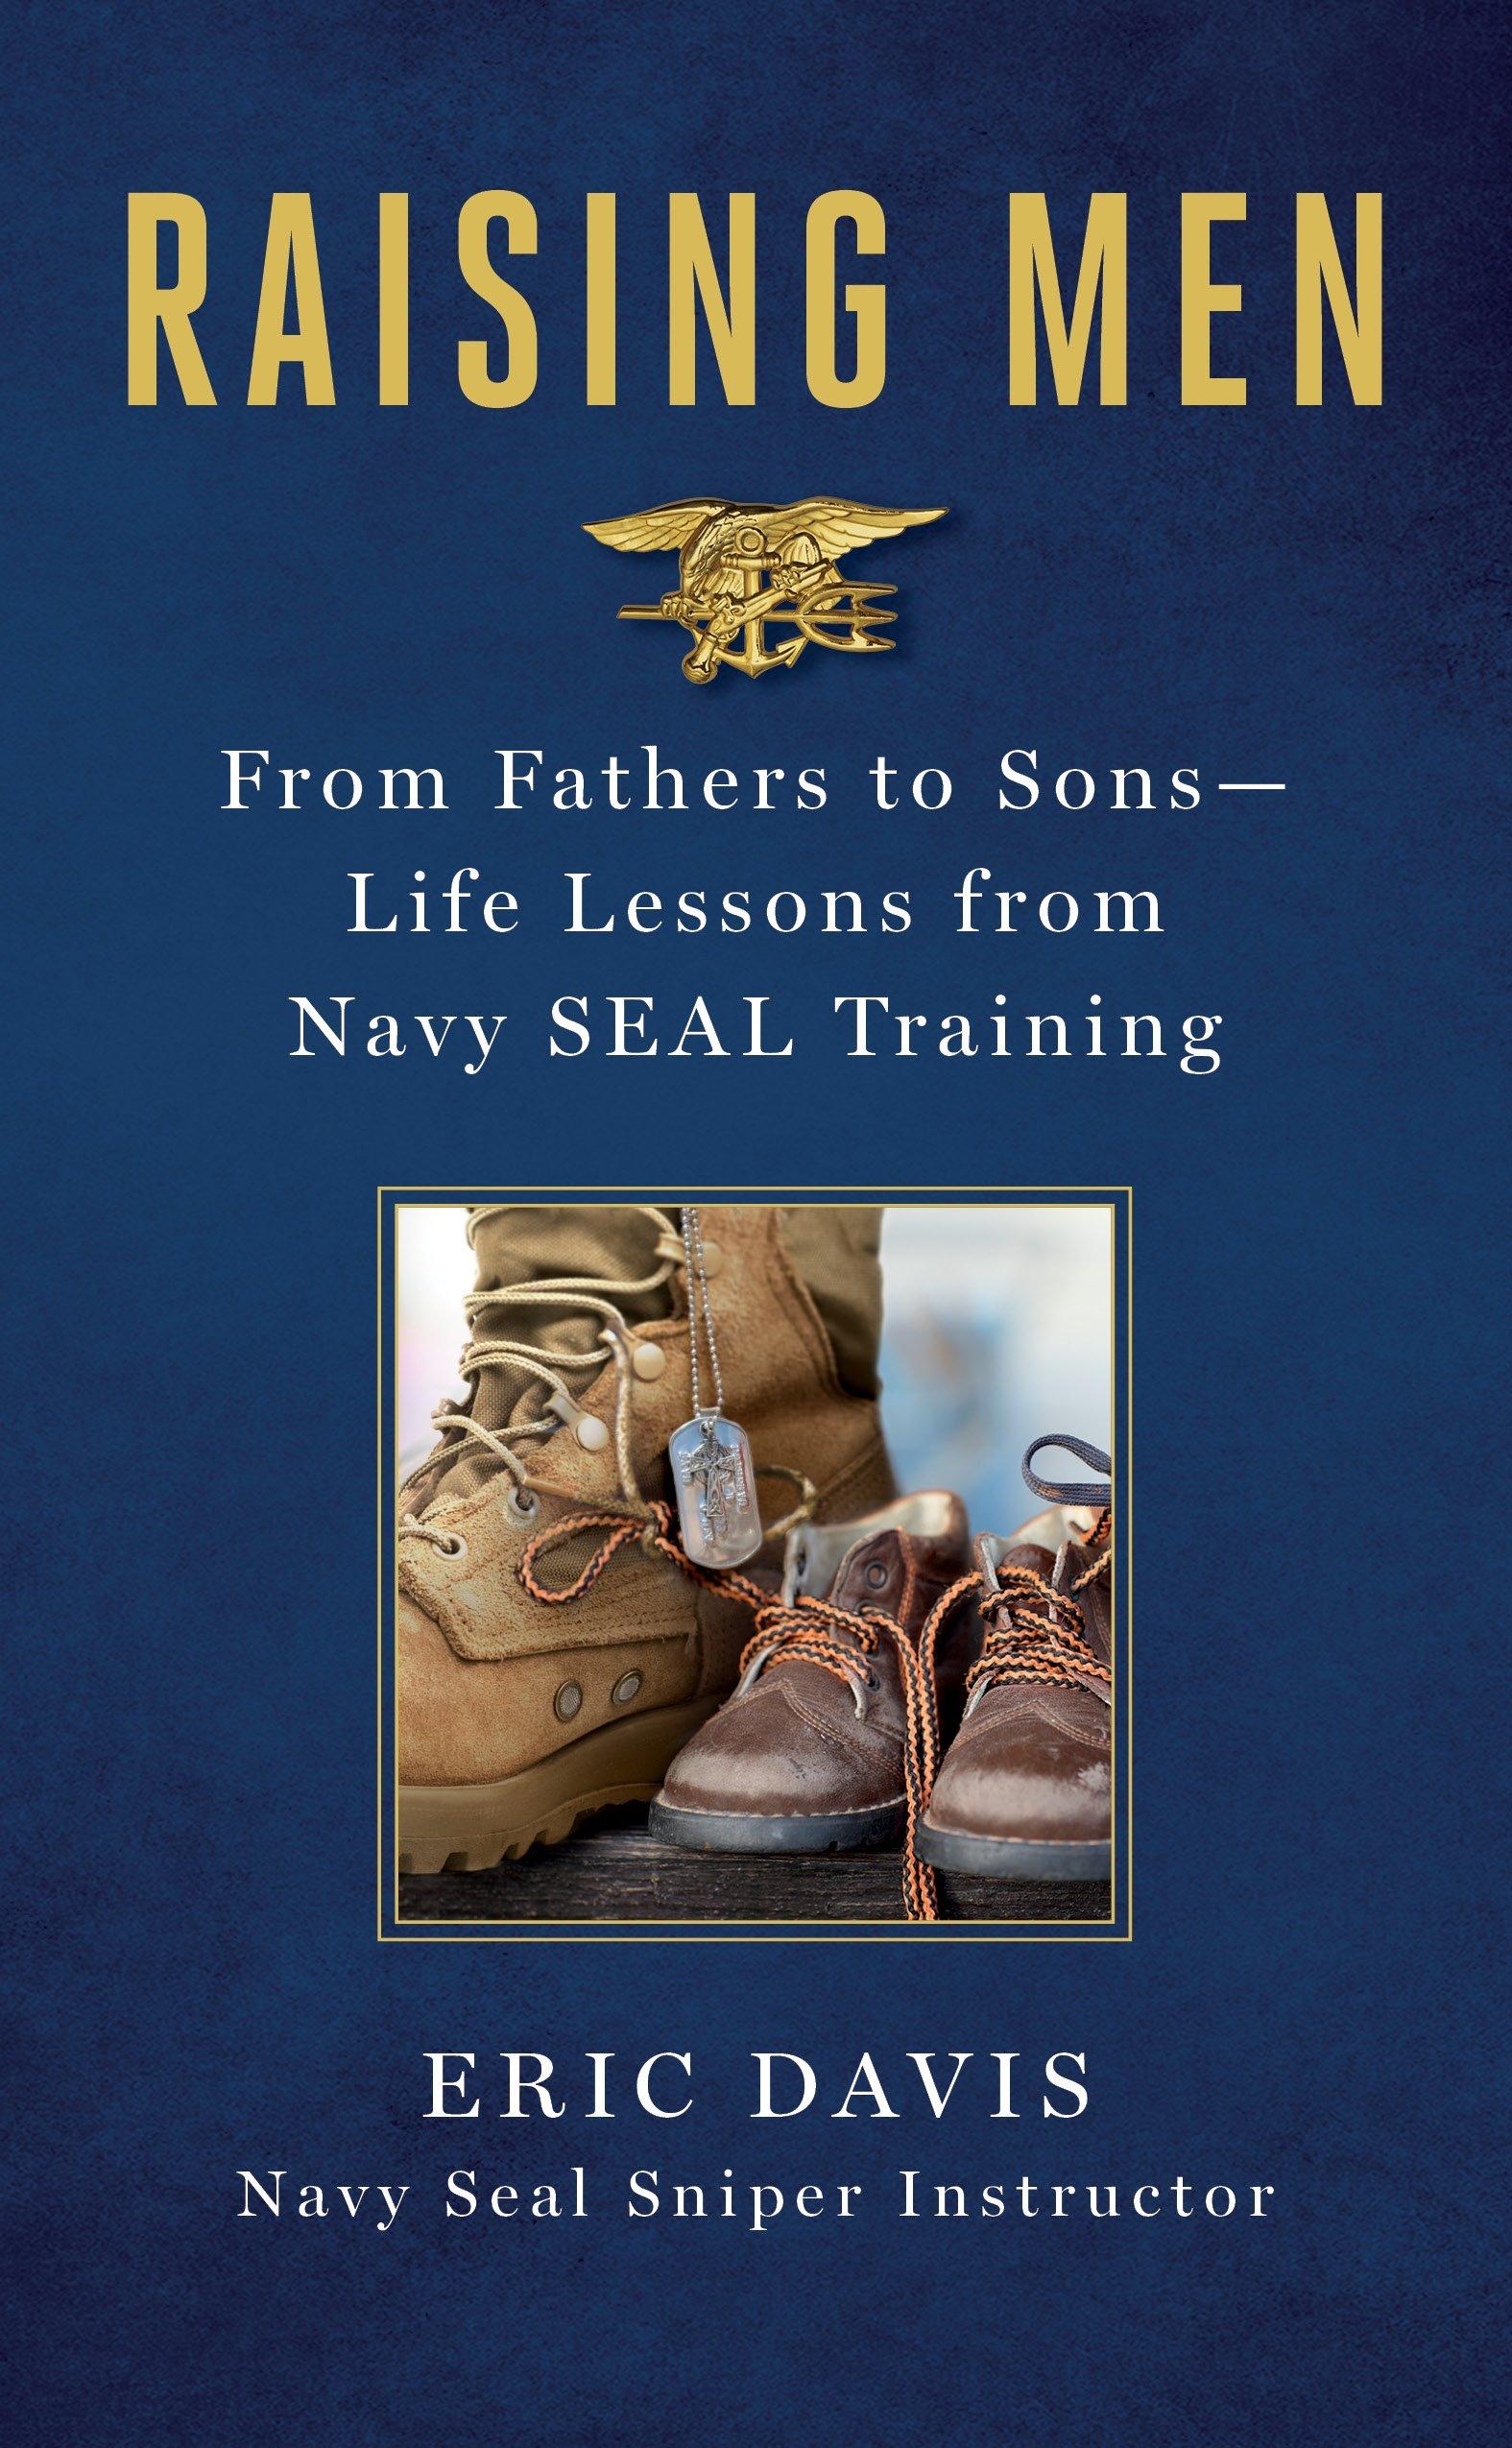 Raising Men Fathers Lessons Training product image